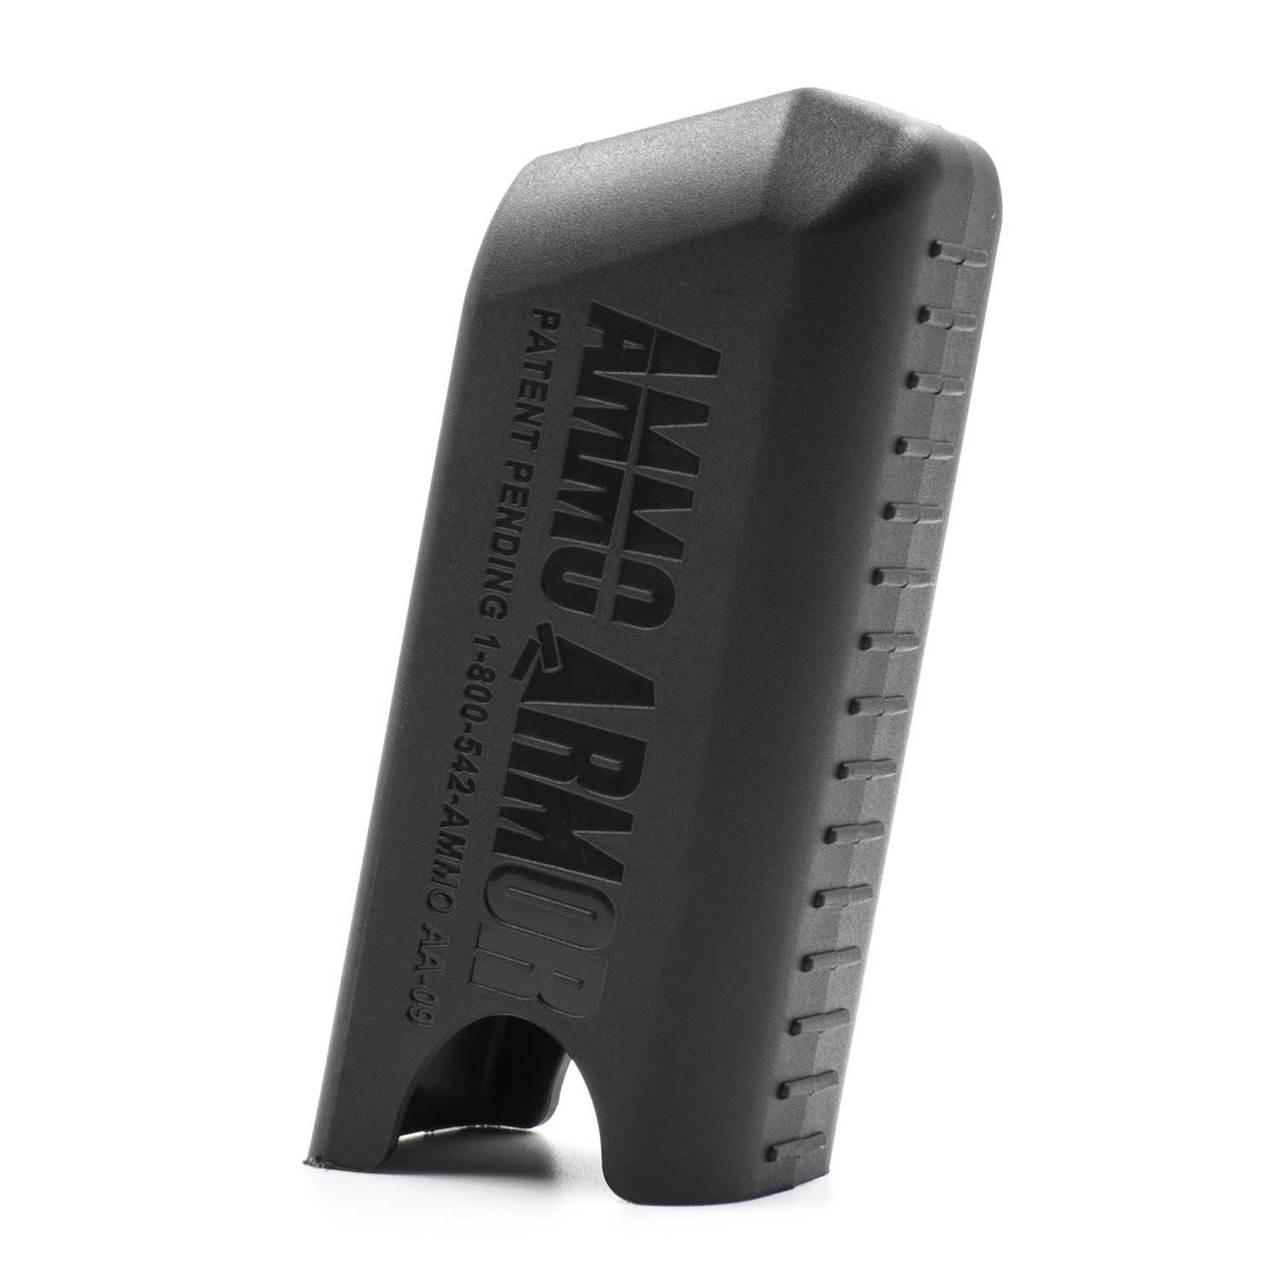 Glock 33 Ammo Armor